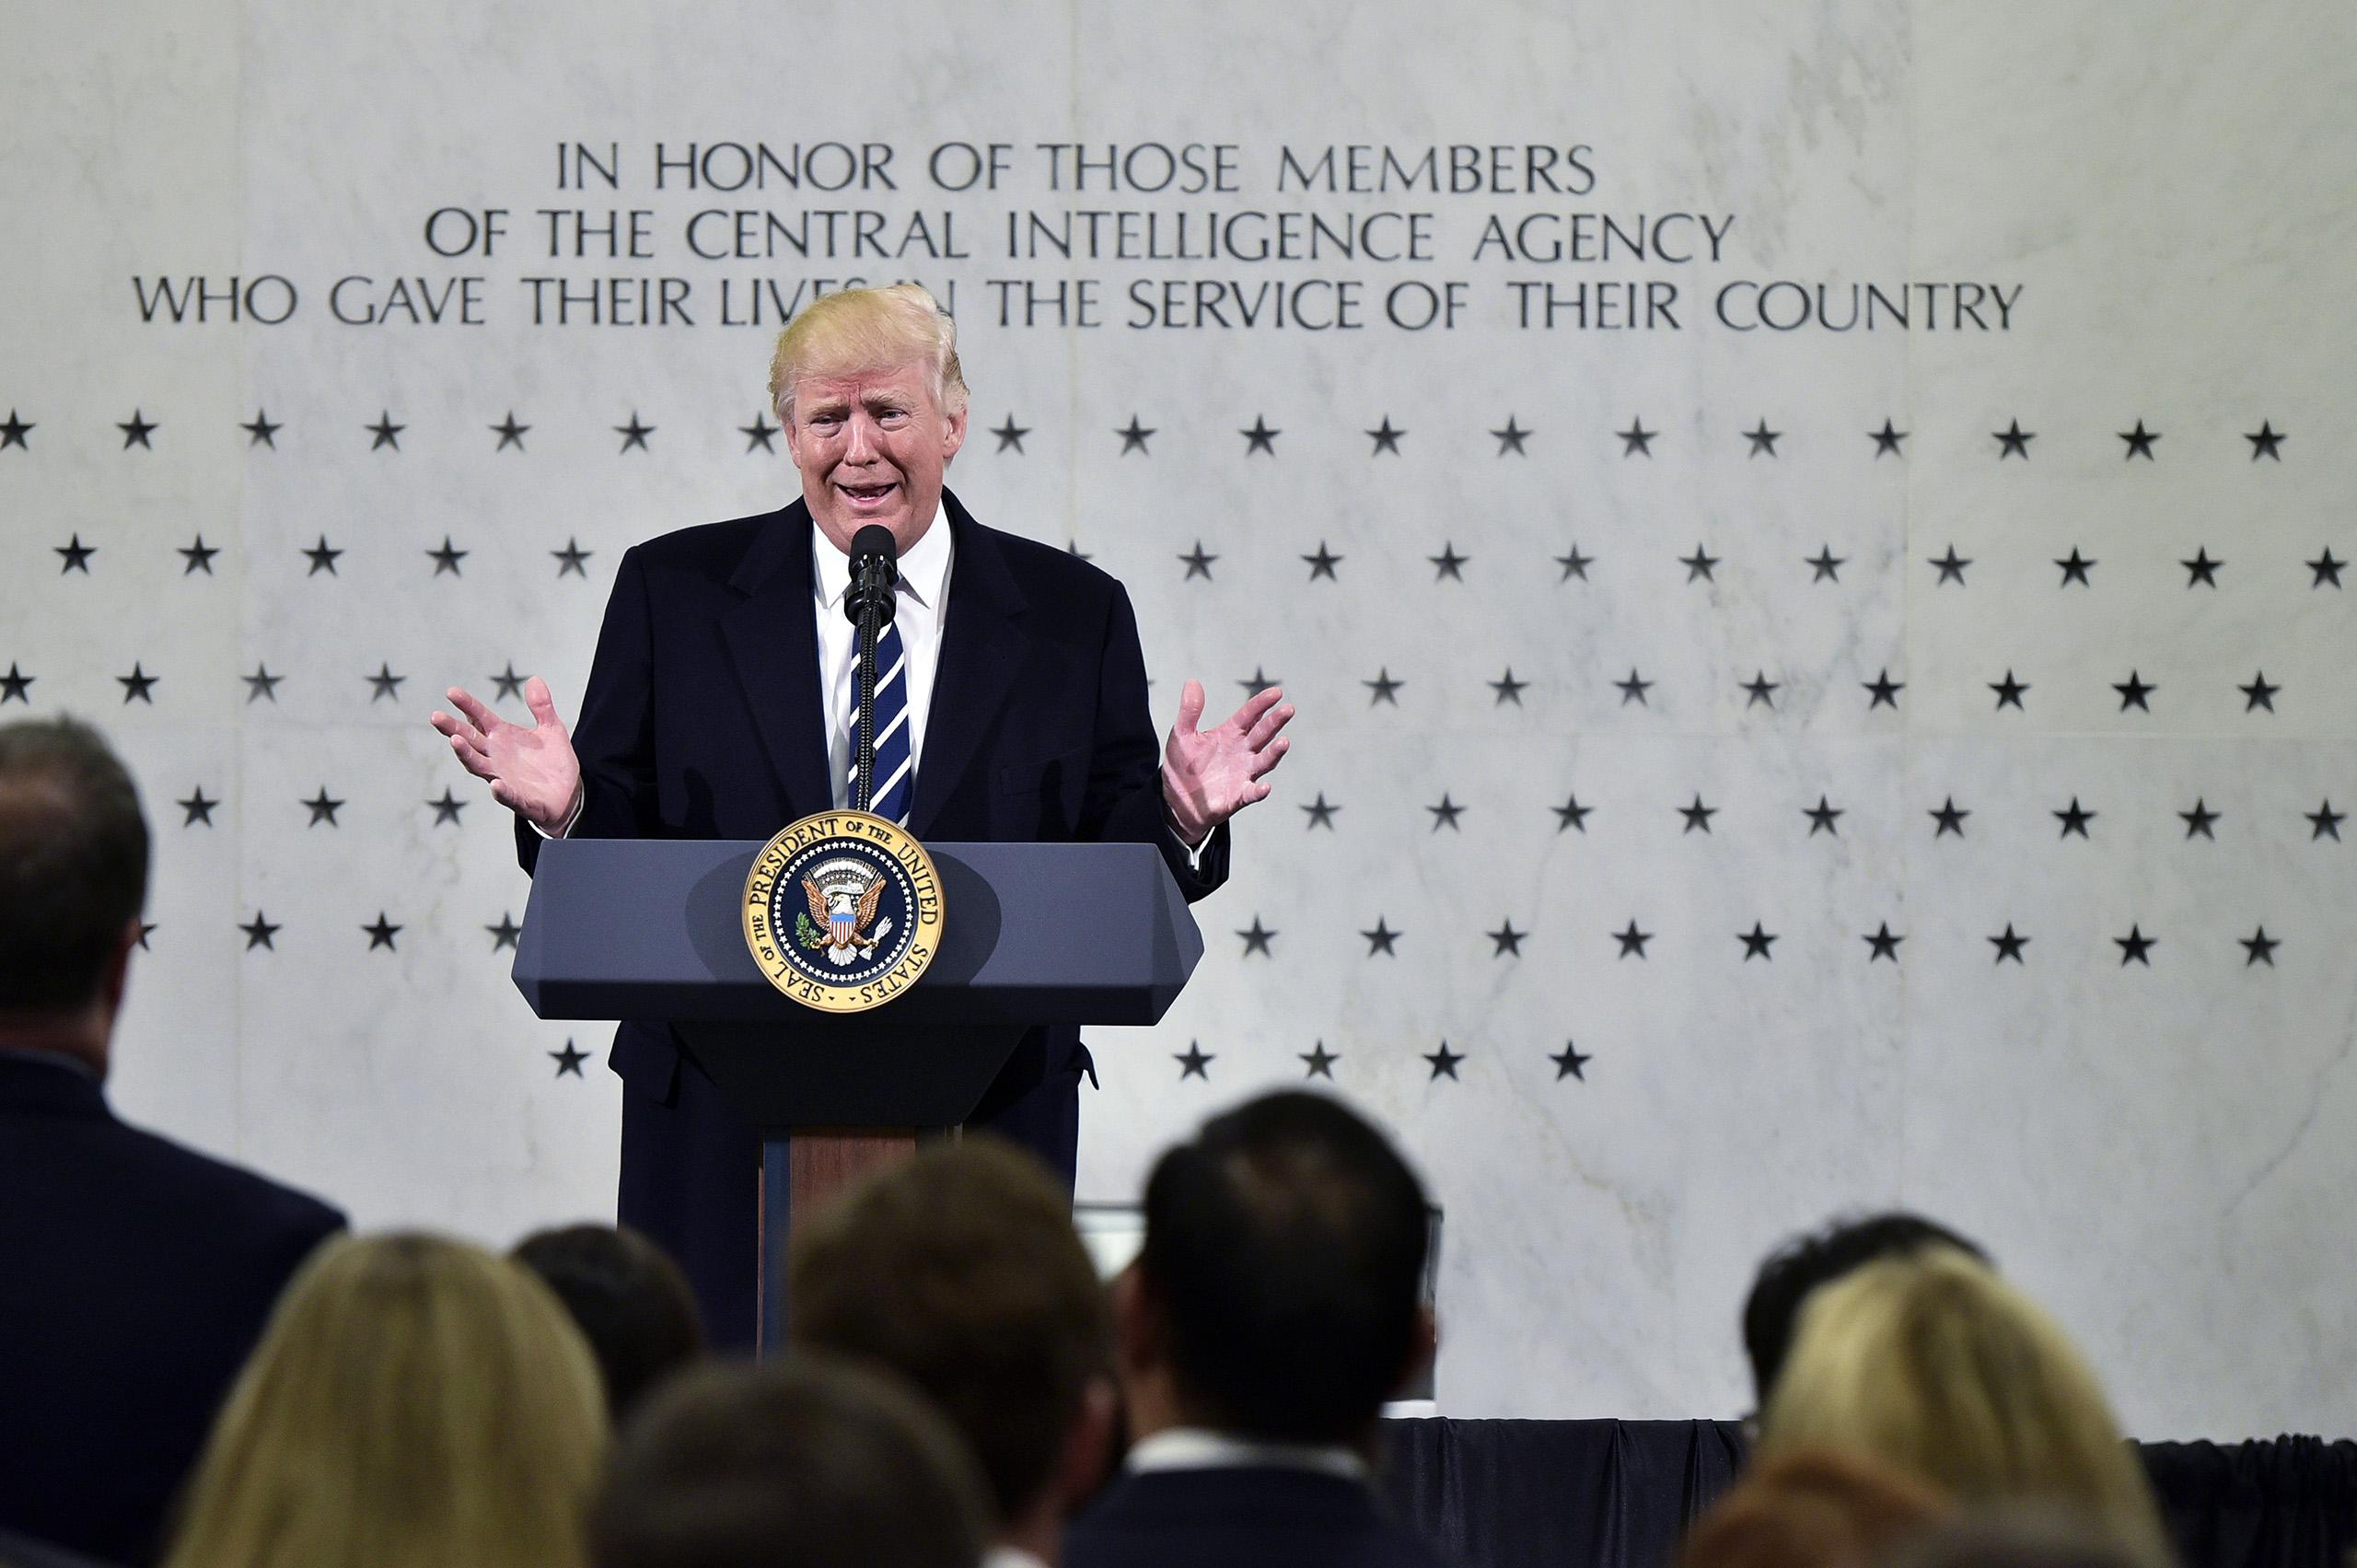 President Donald Trump speaks at CIA Headquarters in Langley, Va., on Jan. 21, 2017.